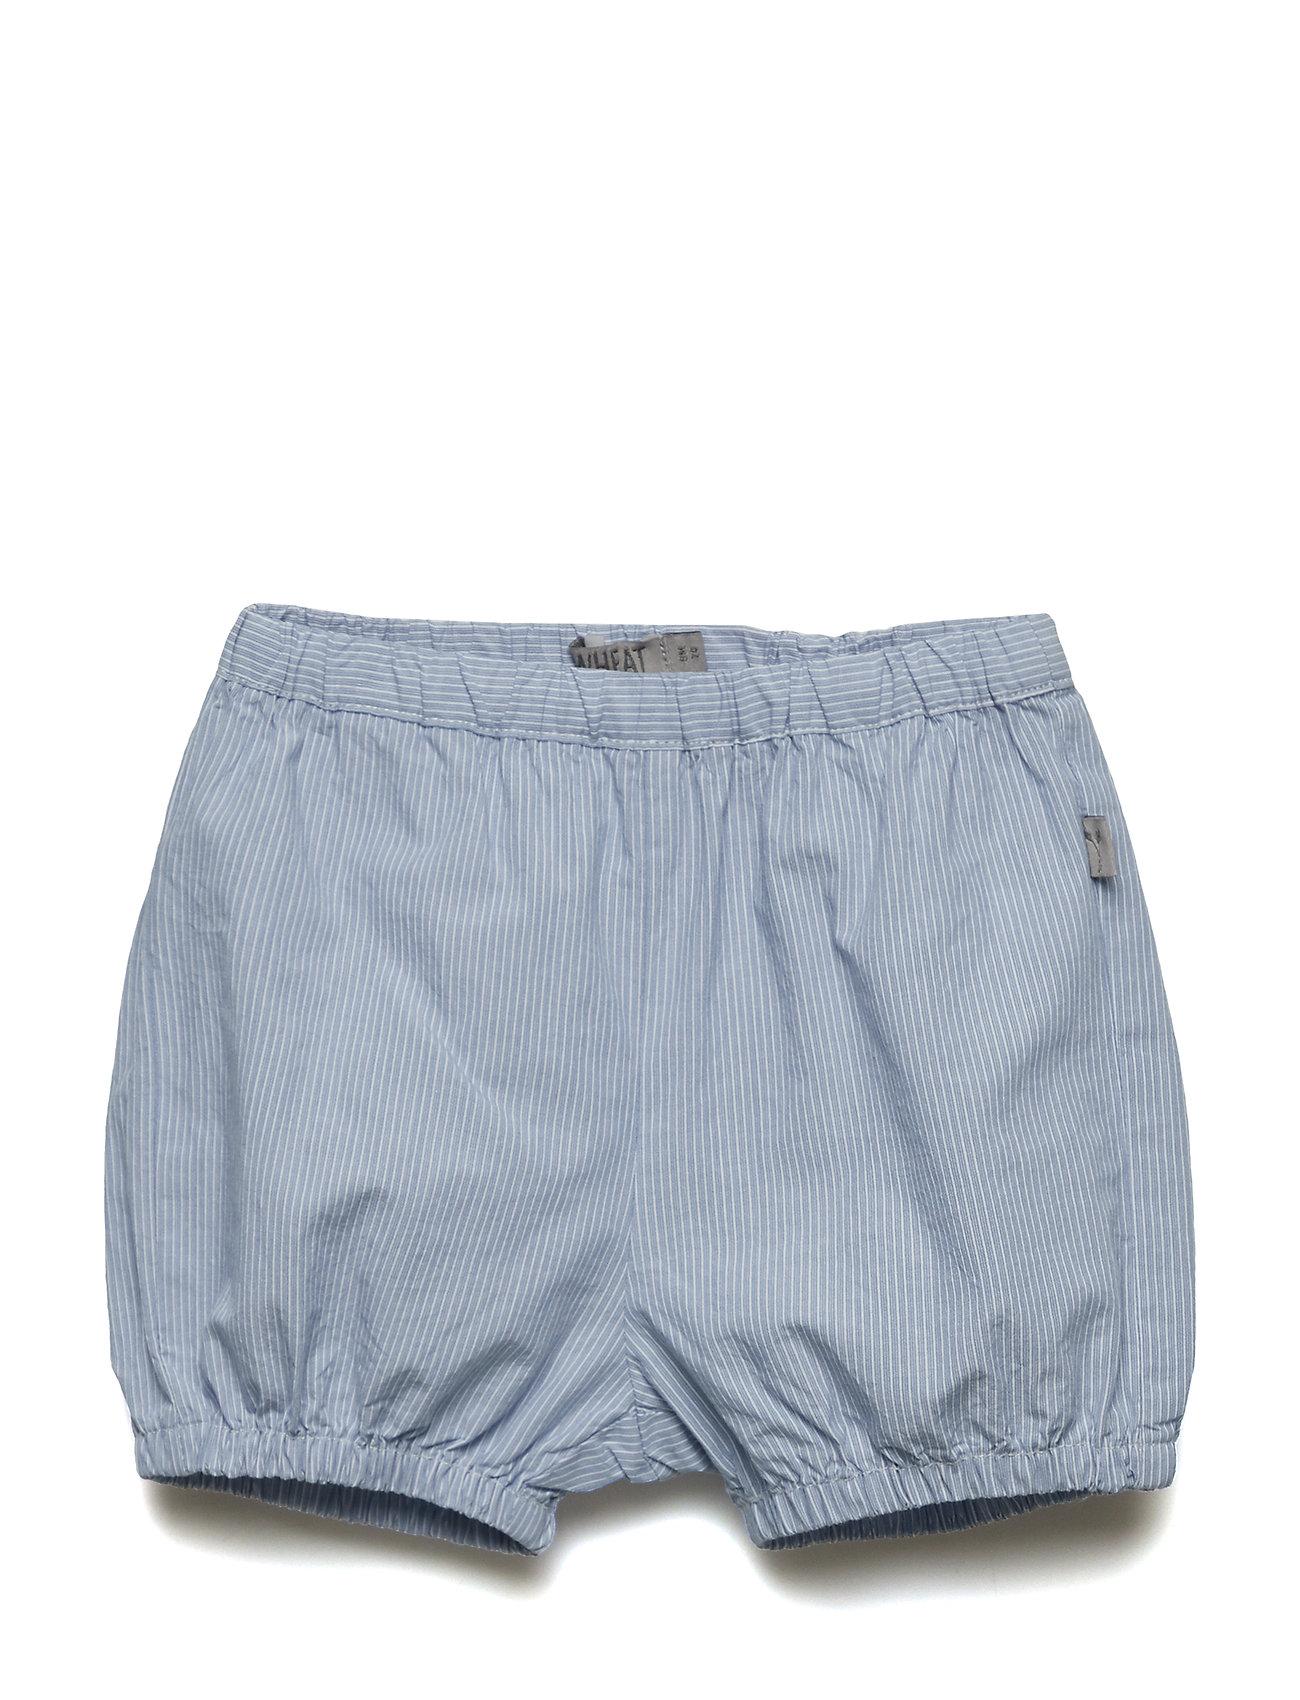 Wheat Shorts Knud - OCEAN BLUE